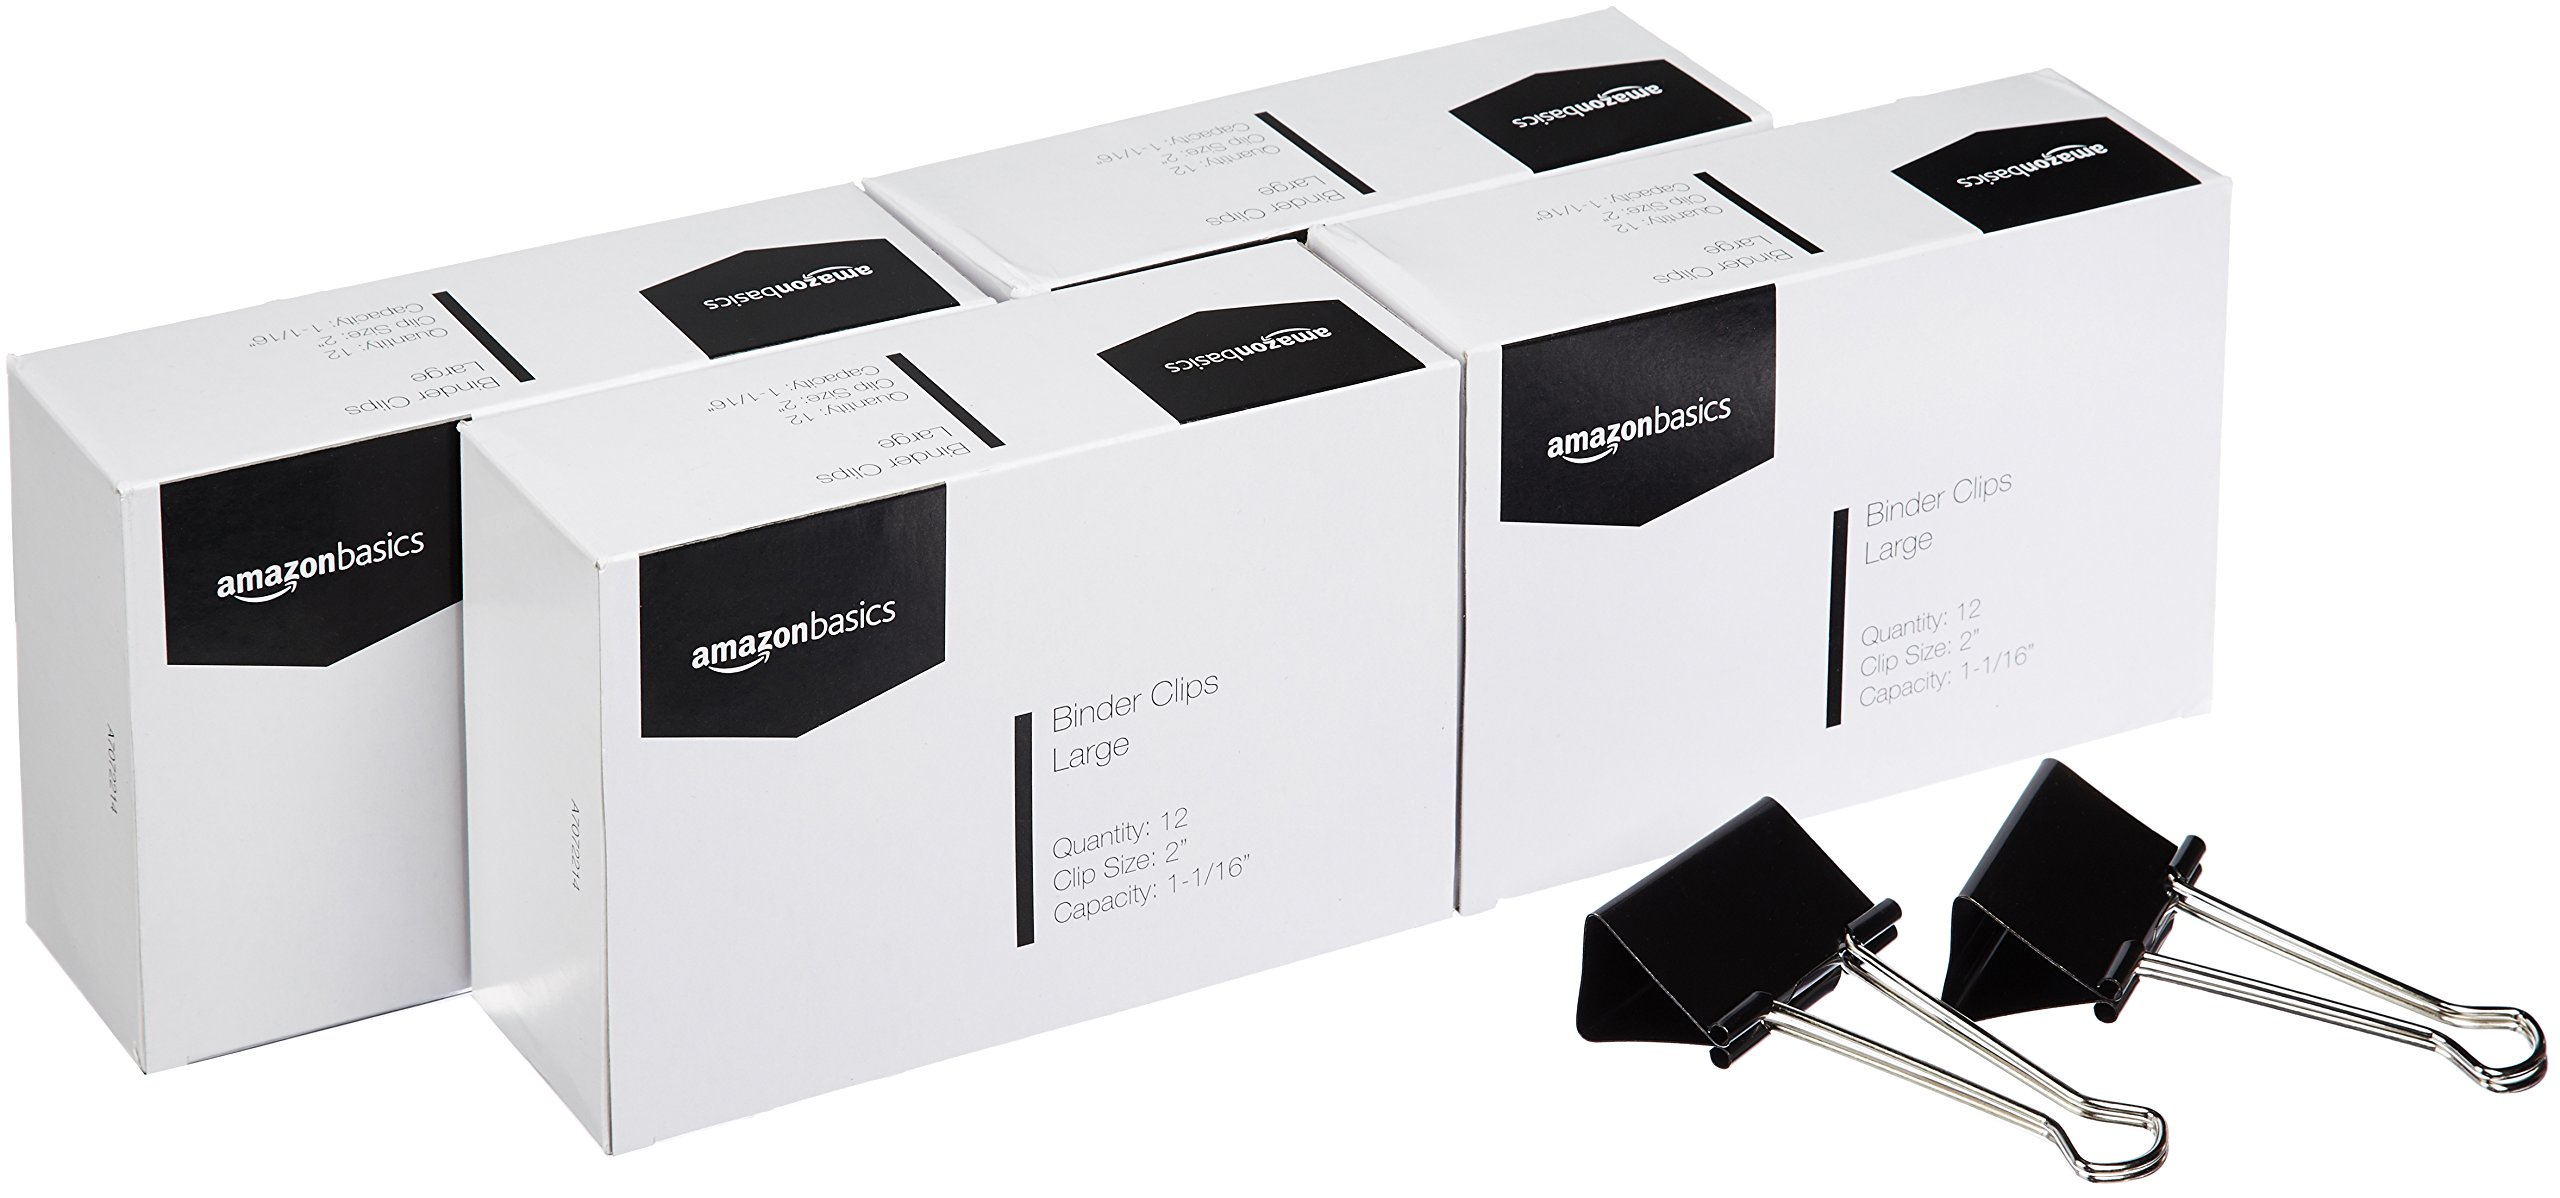 AmazonBasics Binder Clips, Large, 12 per Box, 4-Pack